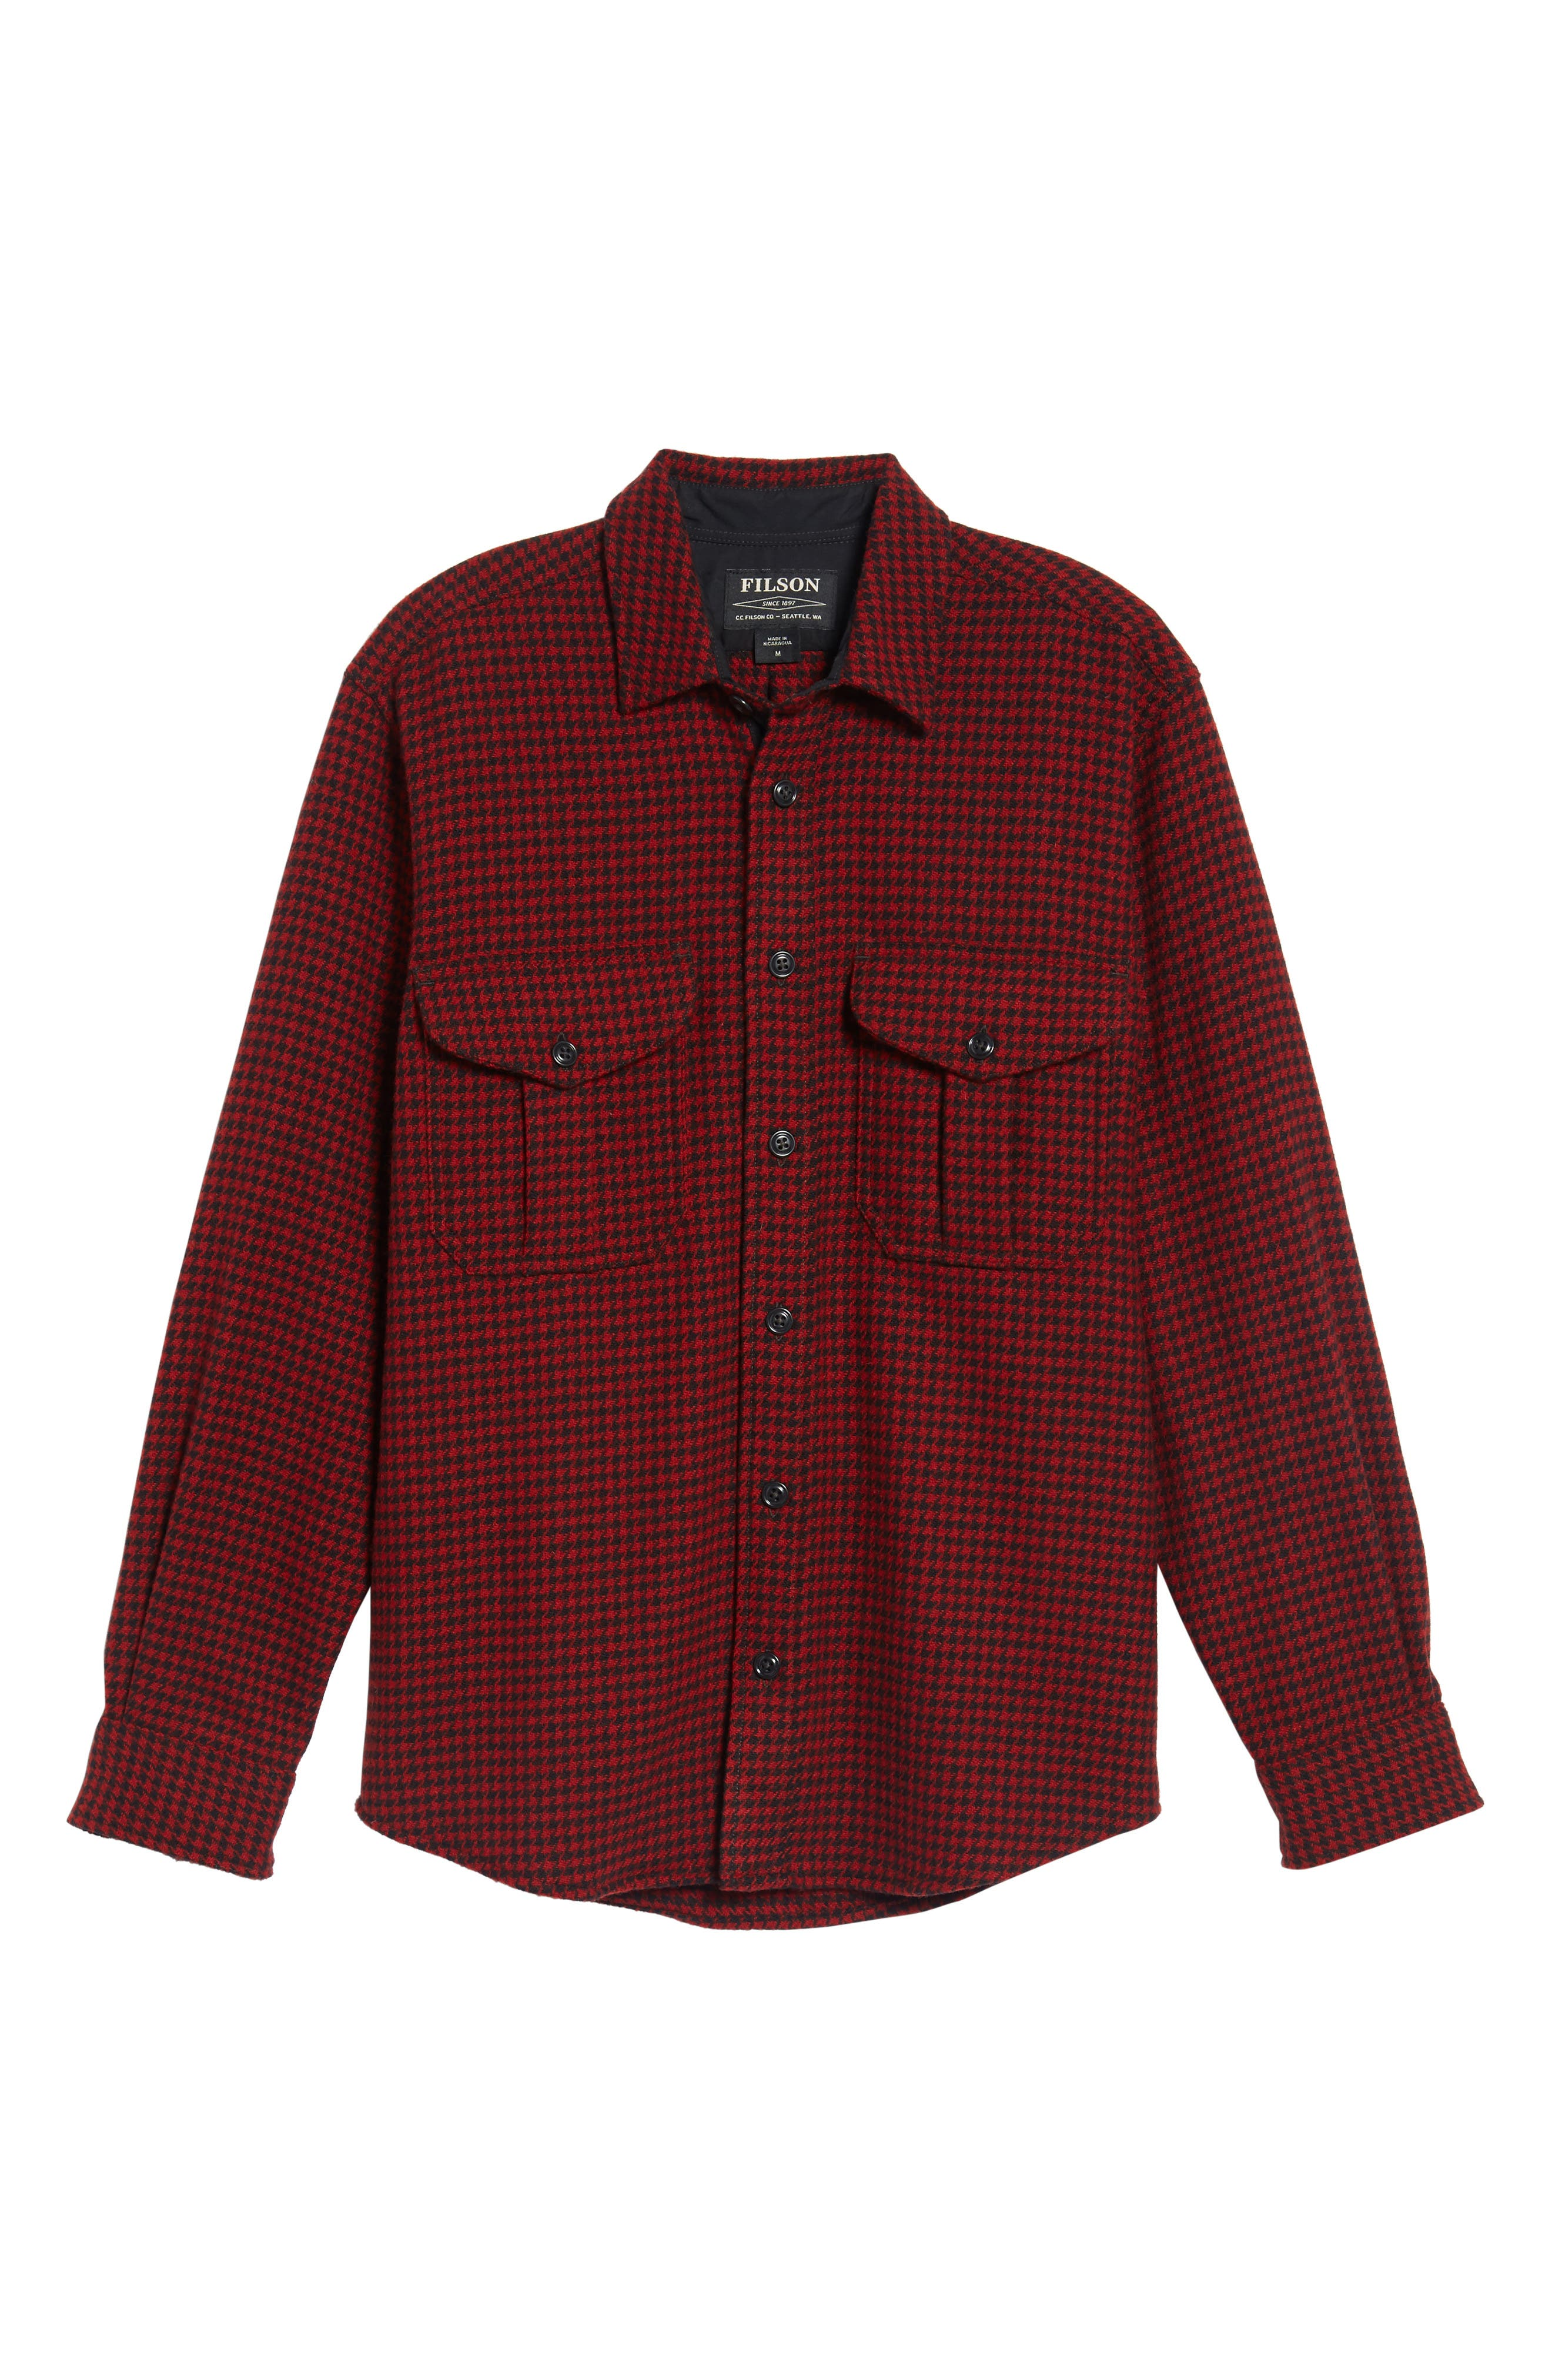 Northwest Houndstooth Shirt Jacket,                             Alternate thumbnail 6, color,                             645